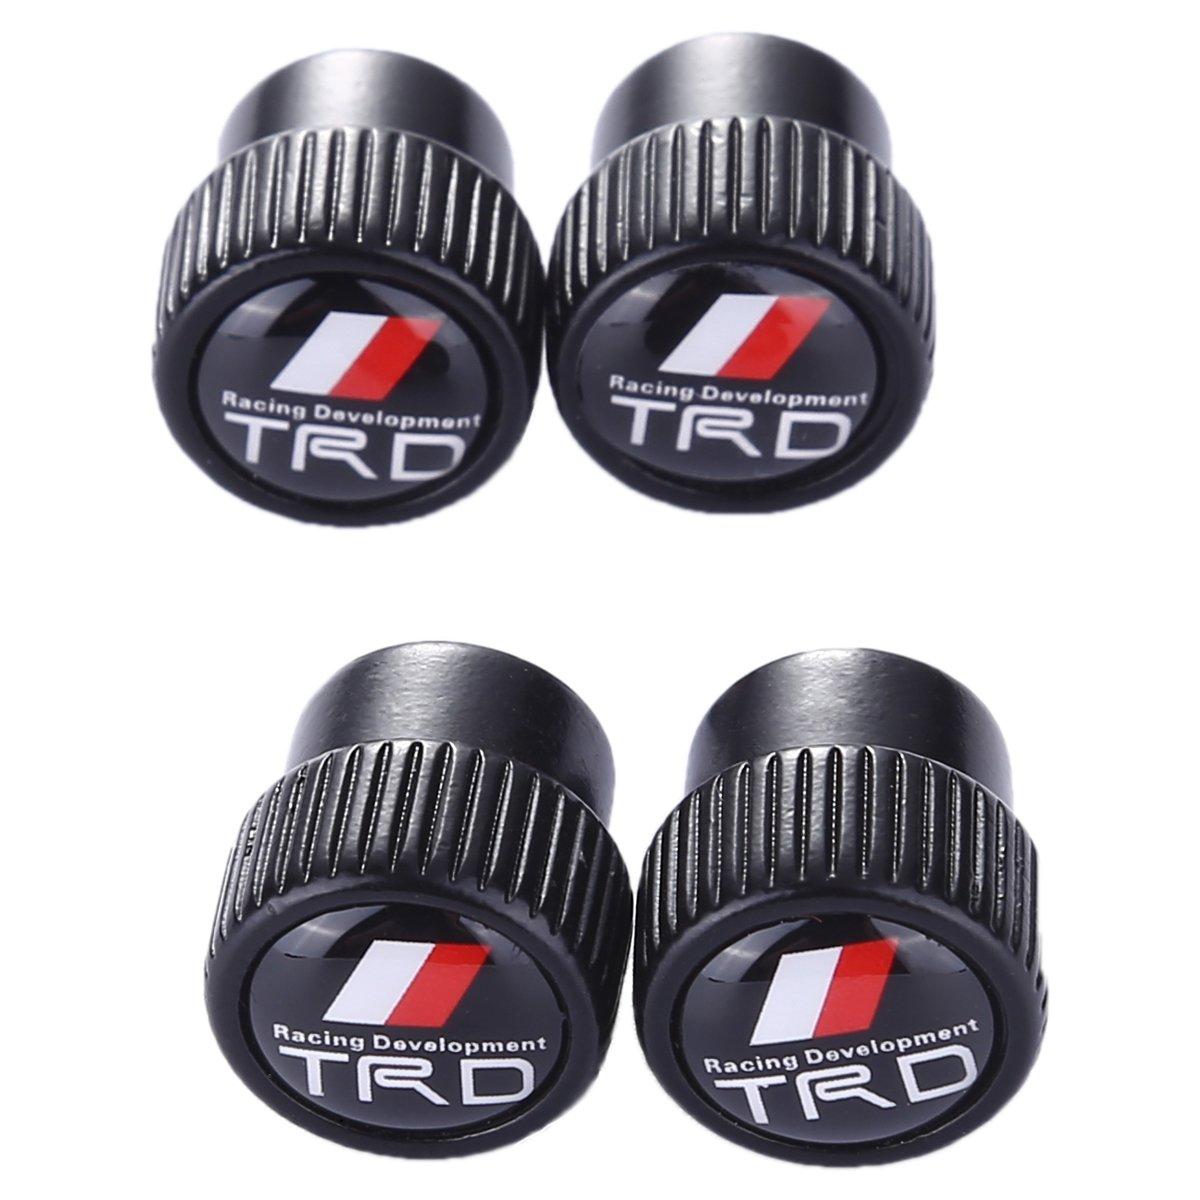 TK-KLZ 4Pcs Chrome TRD Logo Car Bike Scooter SUV Truck Tires Valve Stem Caps for Toyota Racing Development Modified Models Accessory